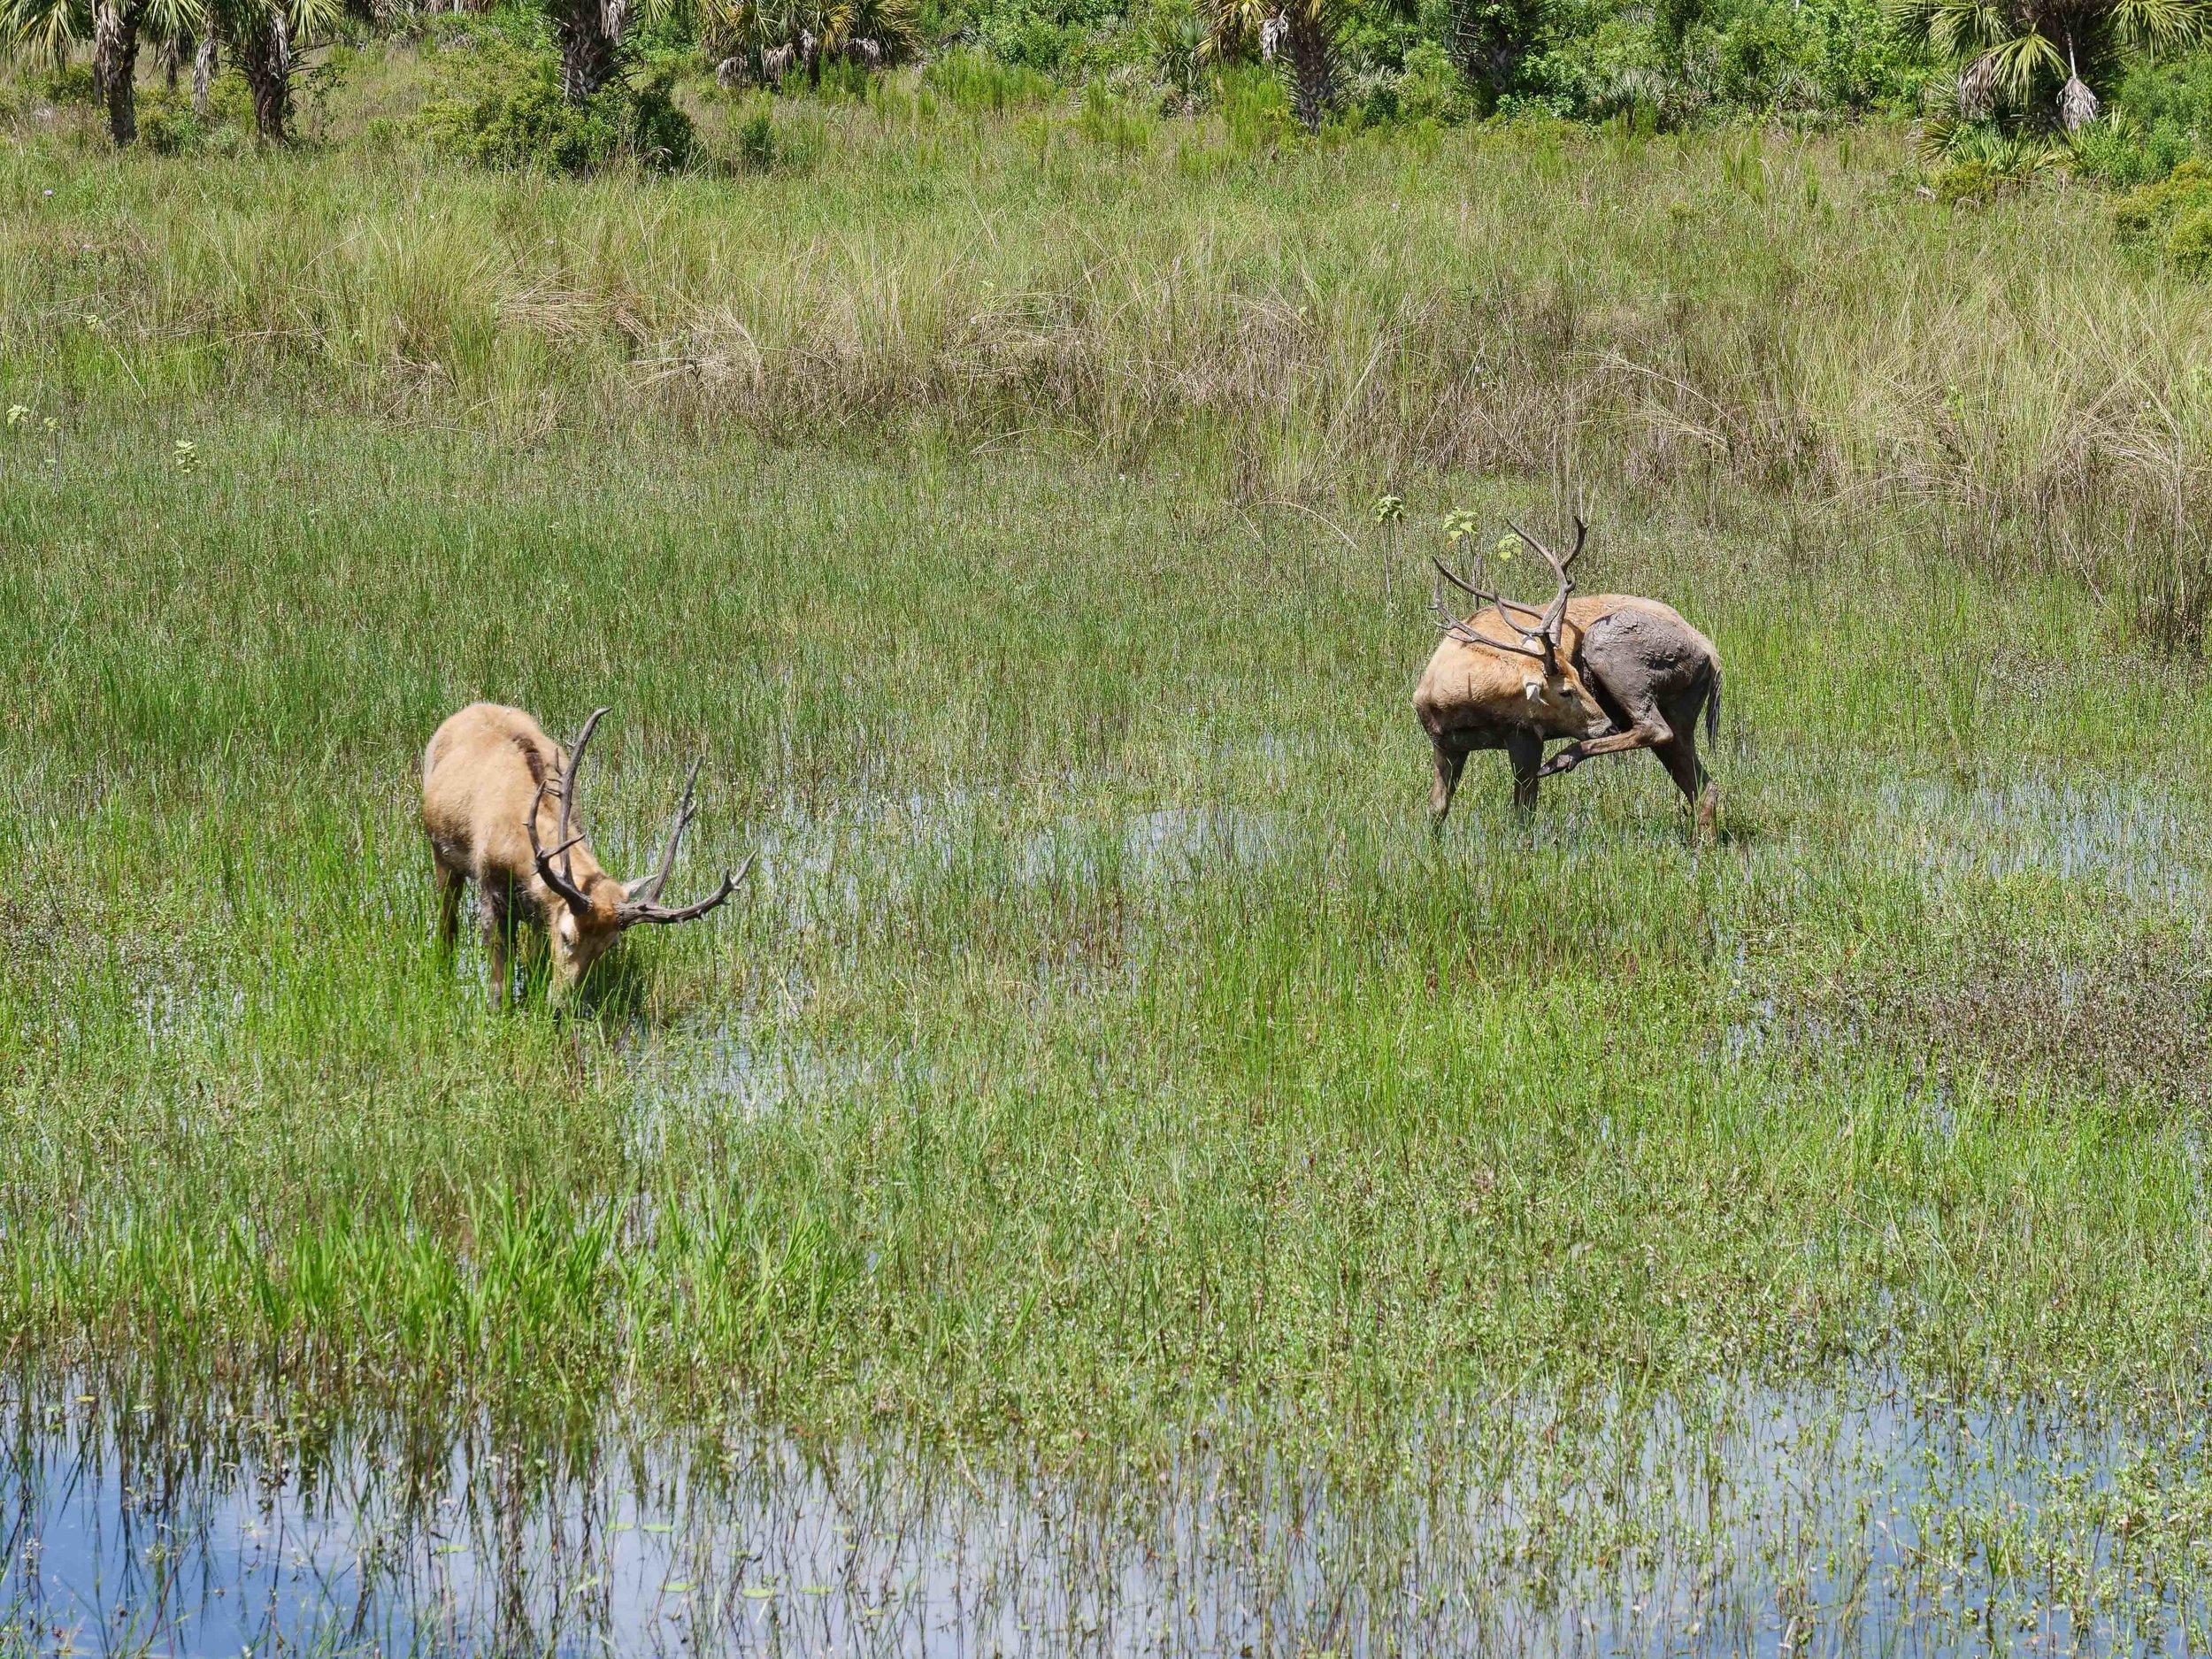 Wildlife in the Everglades.